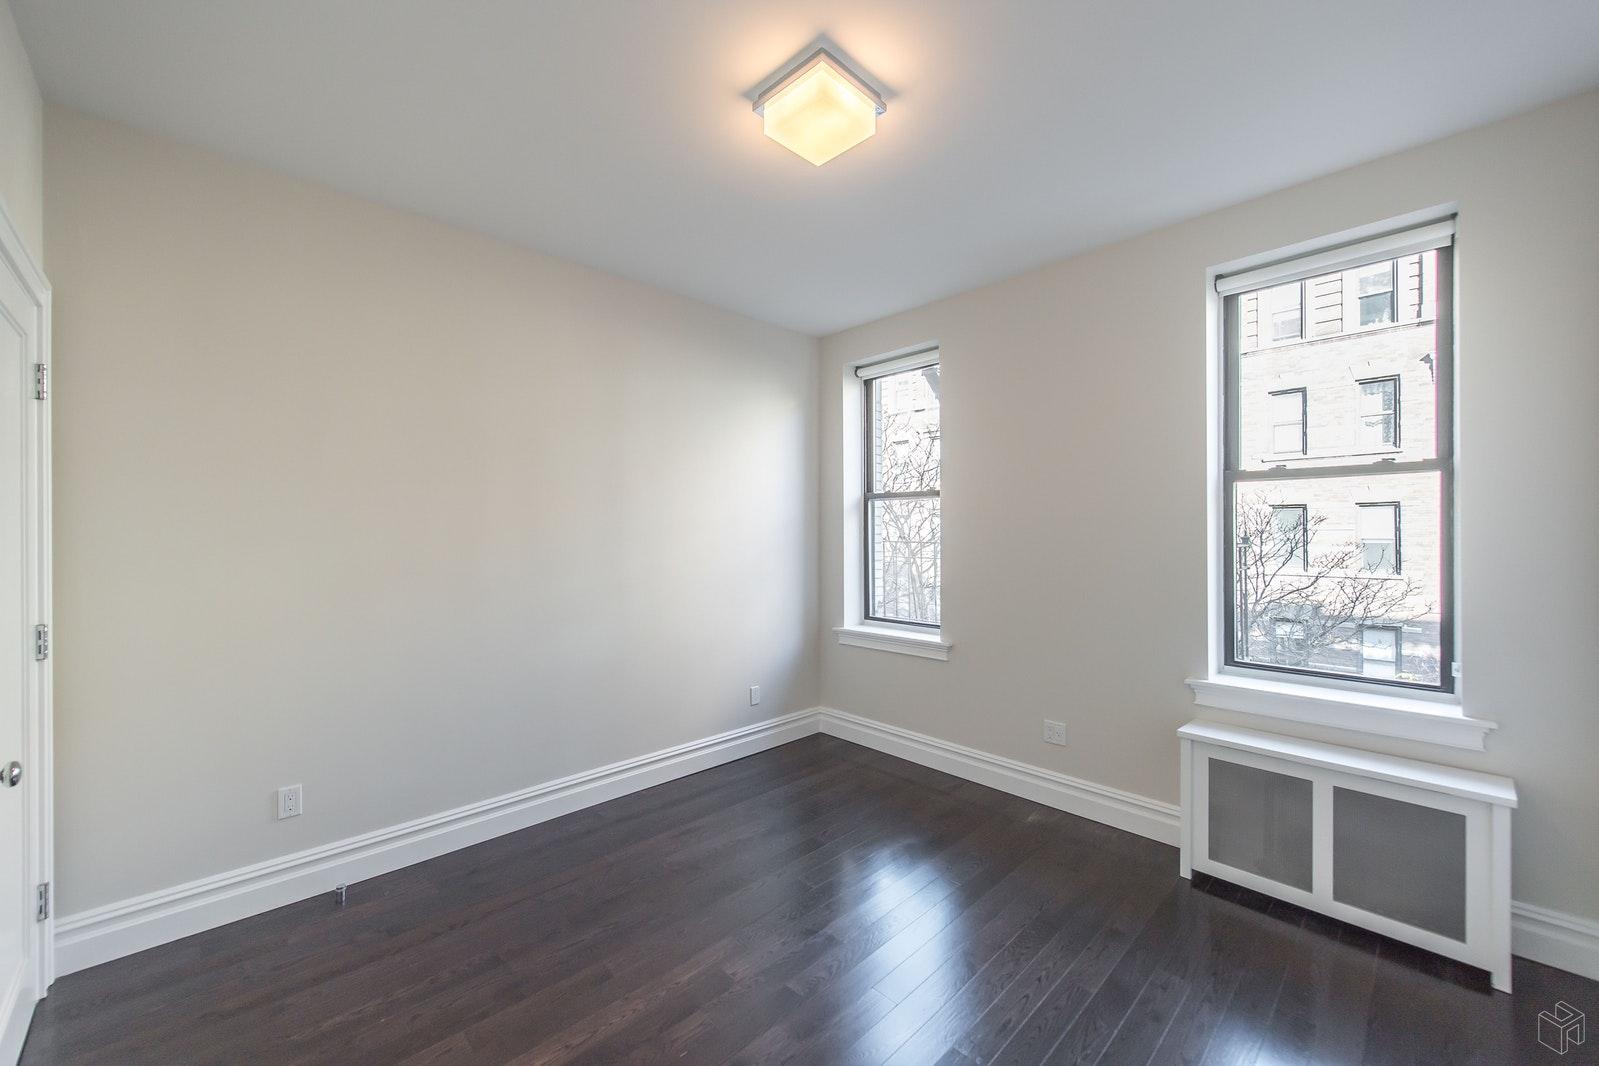 526 WEST 111TH STREET 4CC, Upper West Side, $6,750, Web #: 19580846